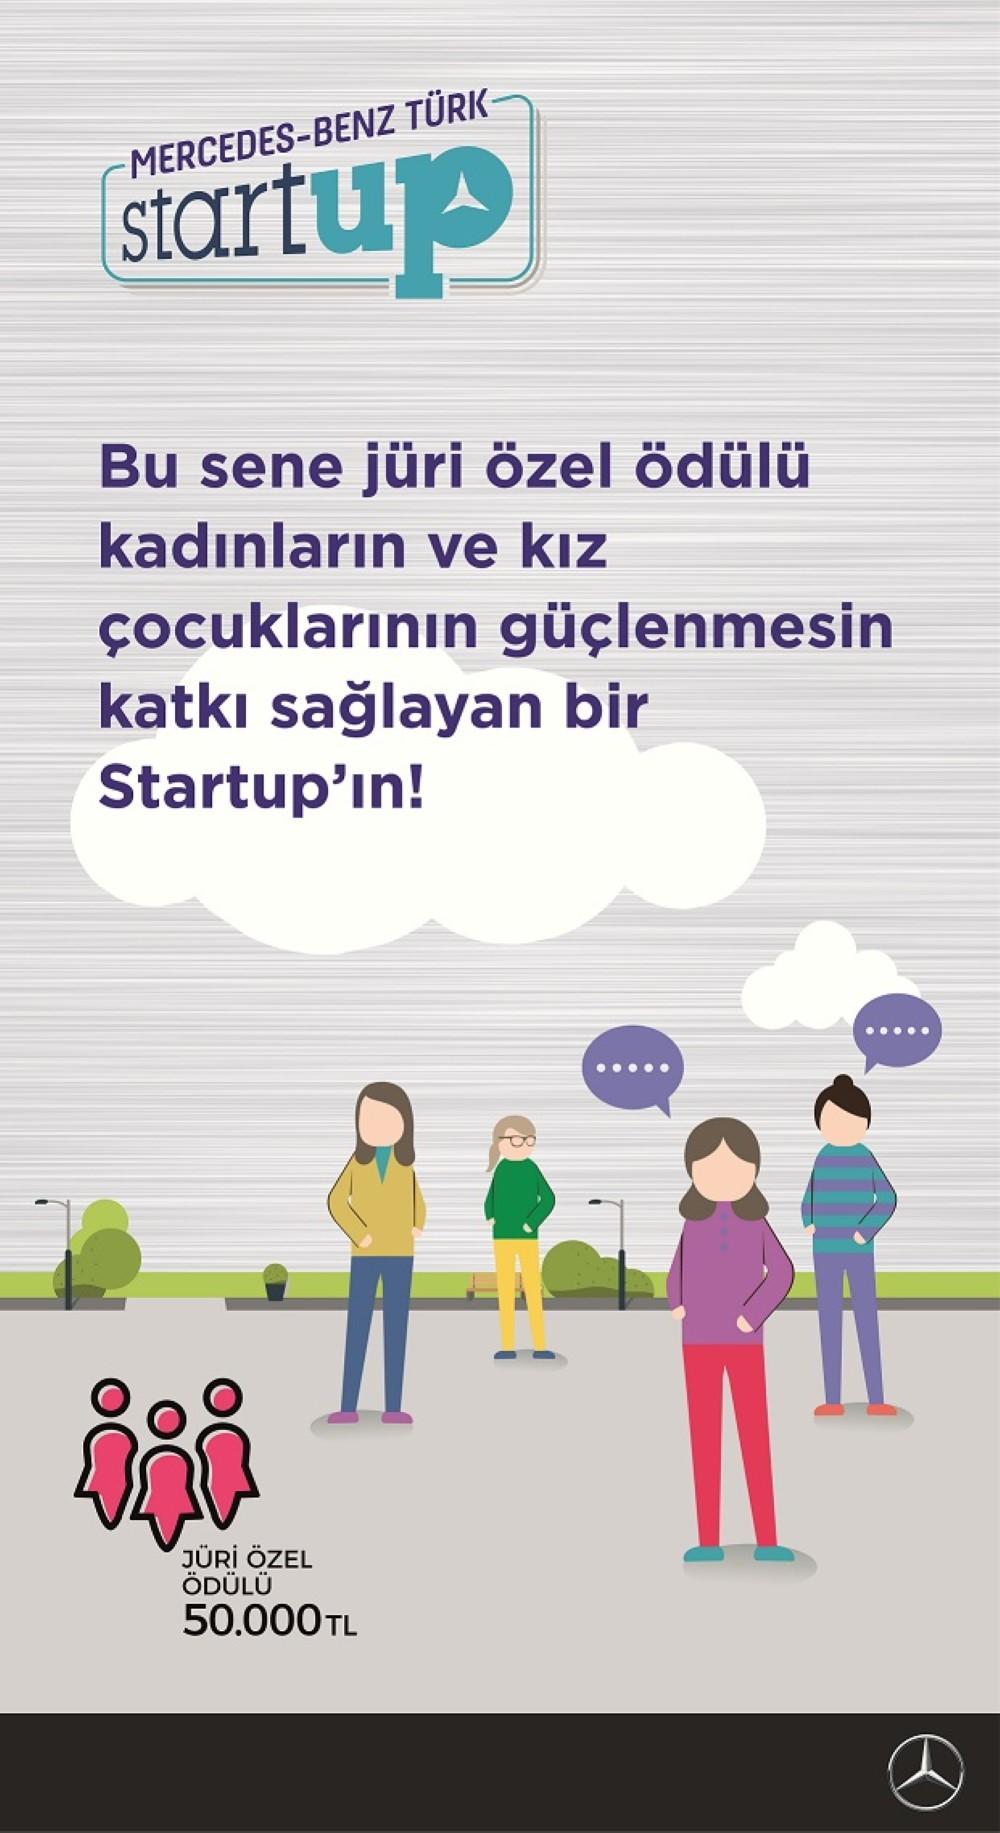 mercedes-benz-turk-startup-yarismasi-basvurulari-tamamlandi.jpg